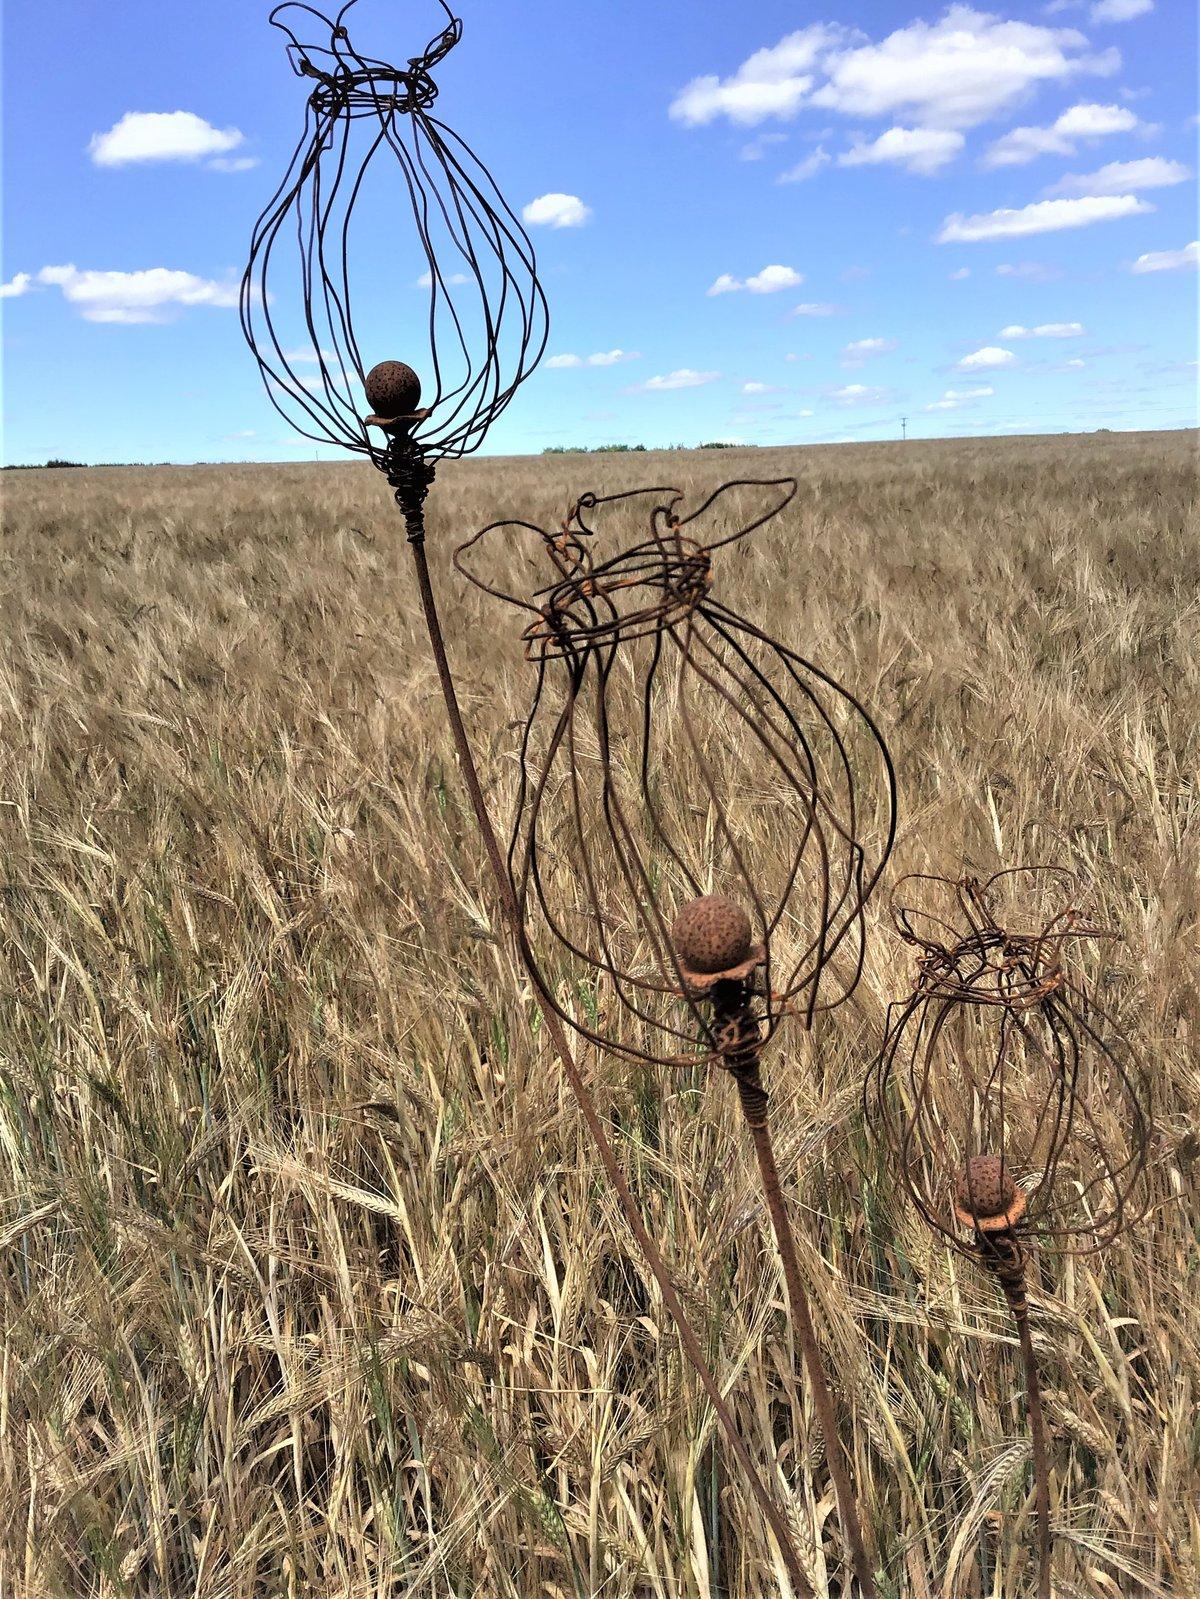 Triple Poppy seeds